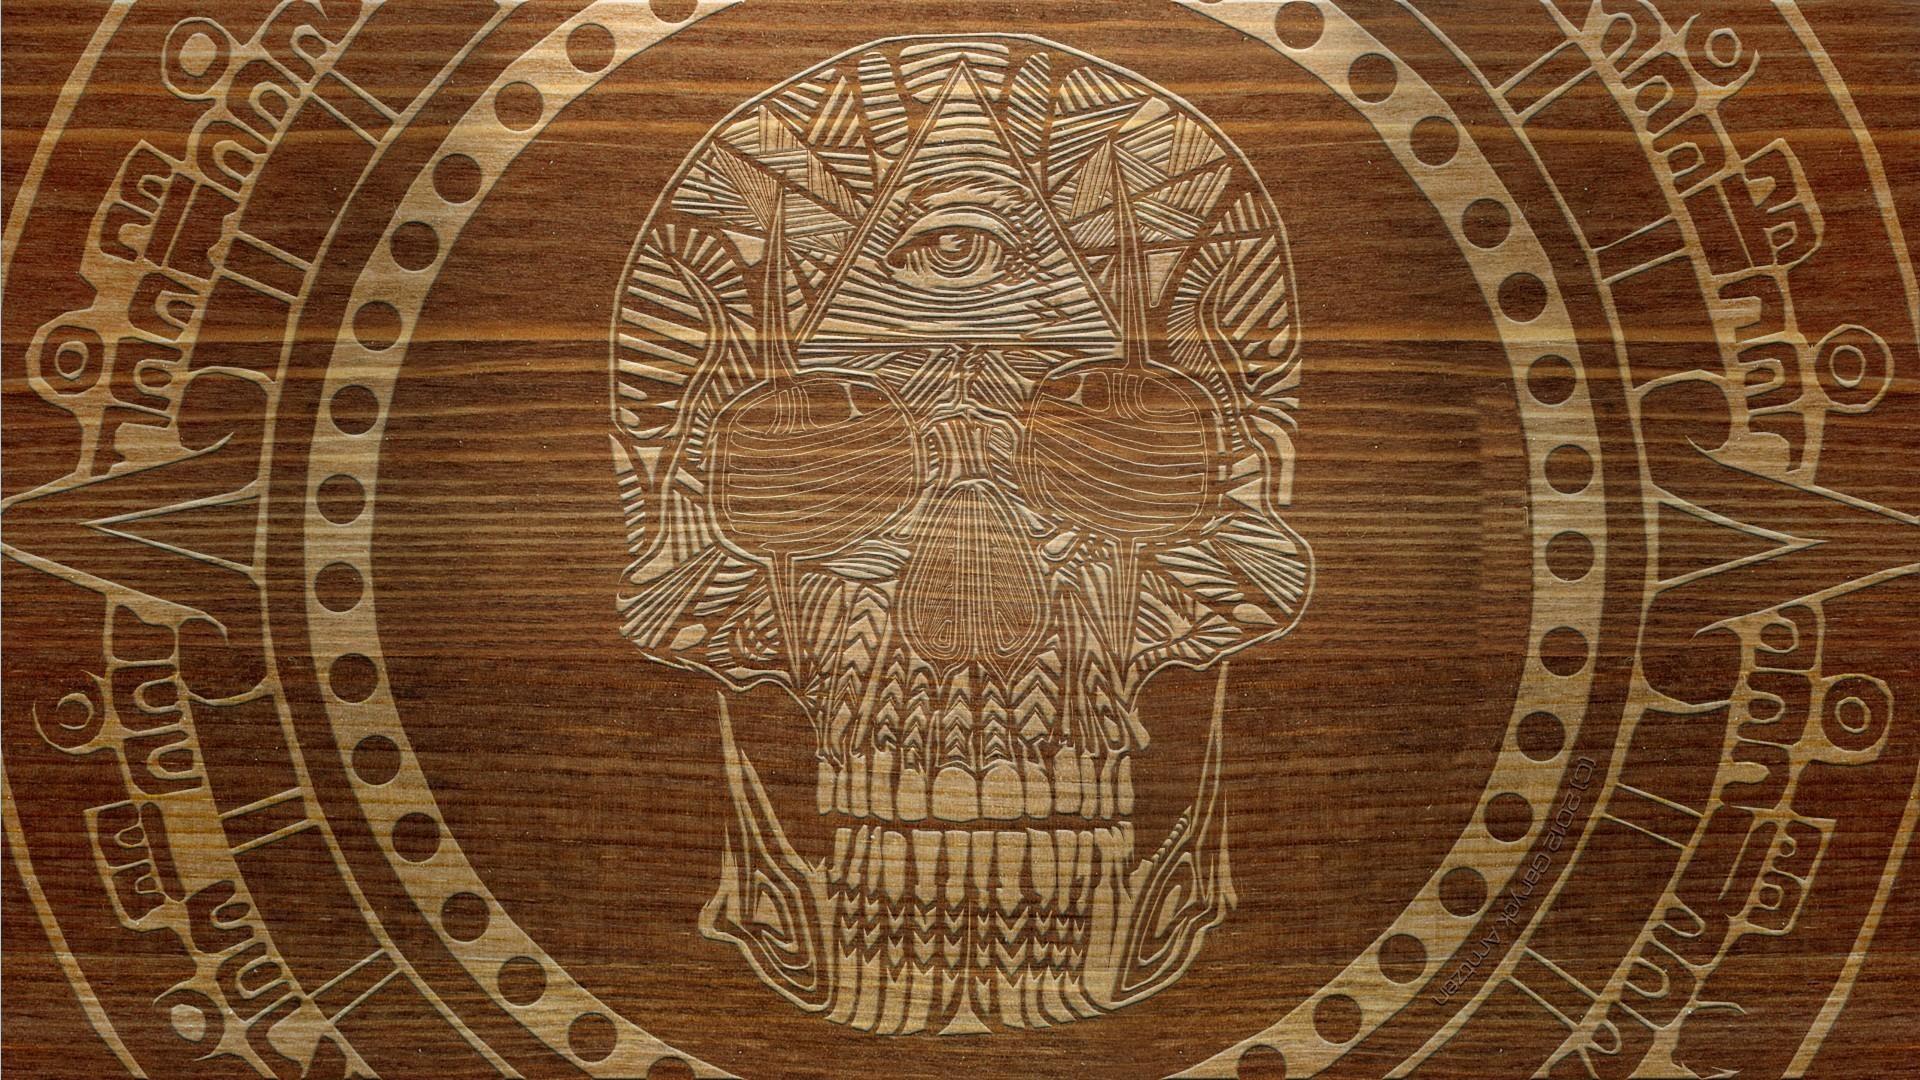 Patterns masonic digital art engraving symbol carving wallpaper .